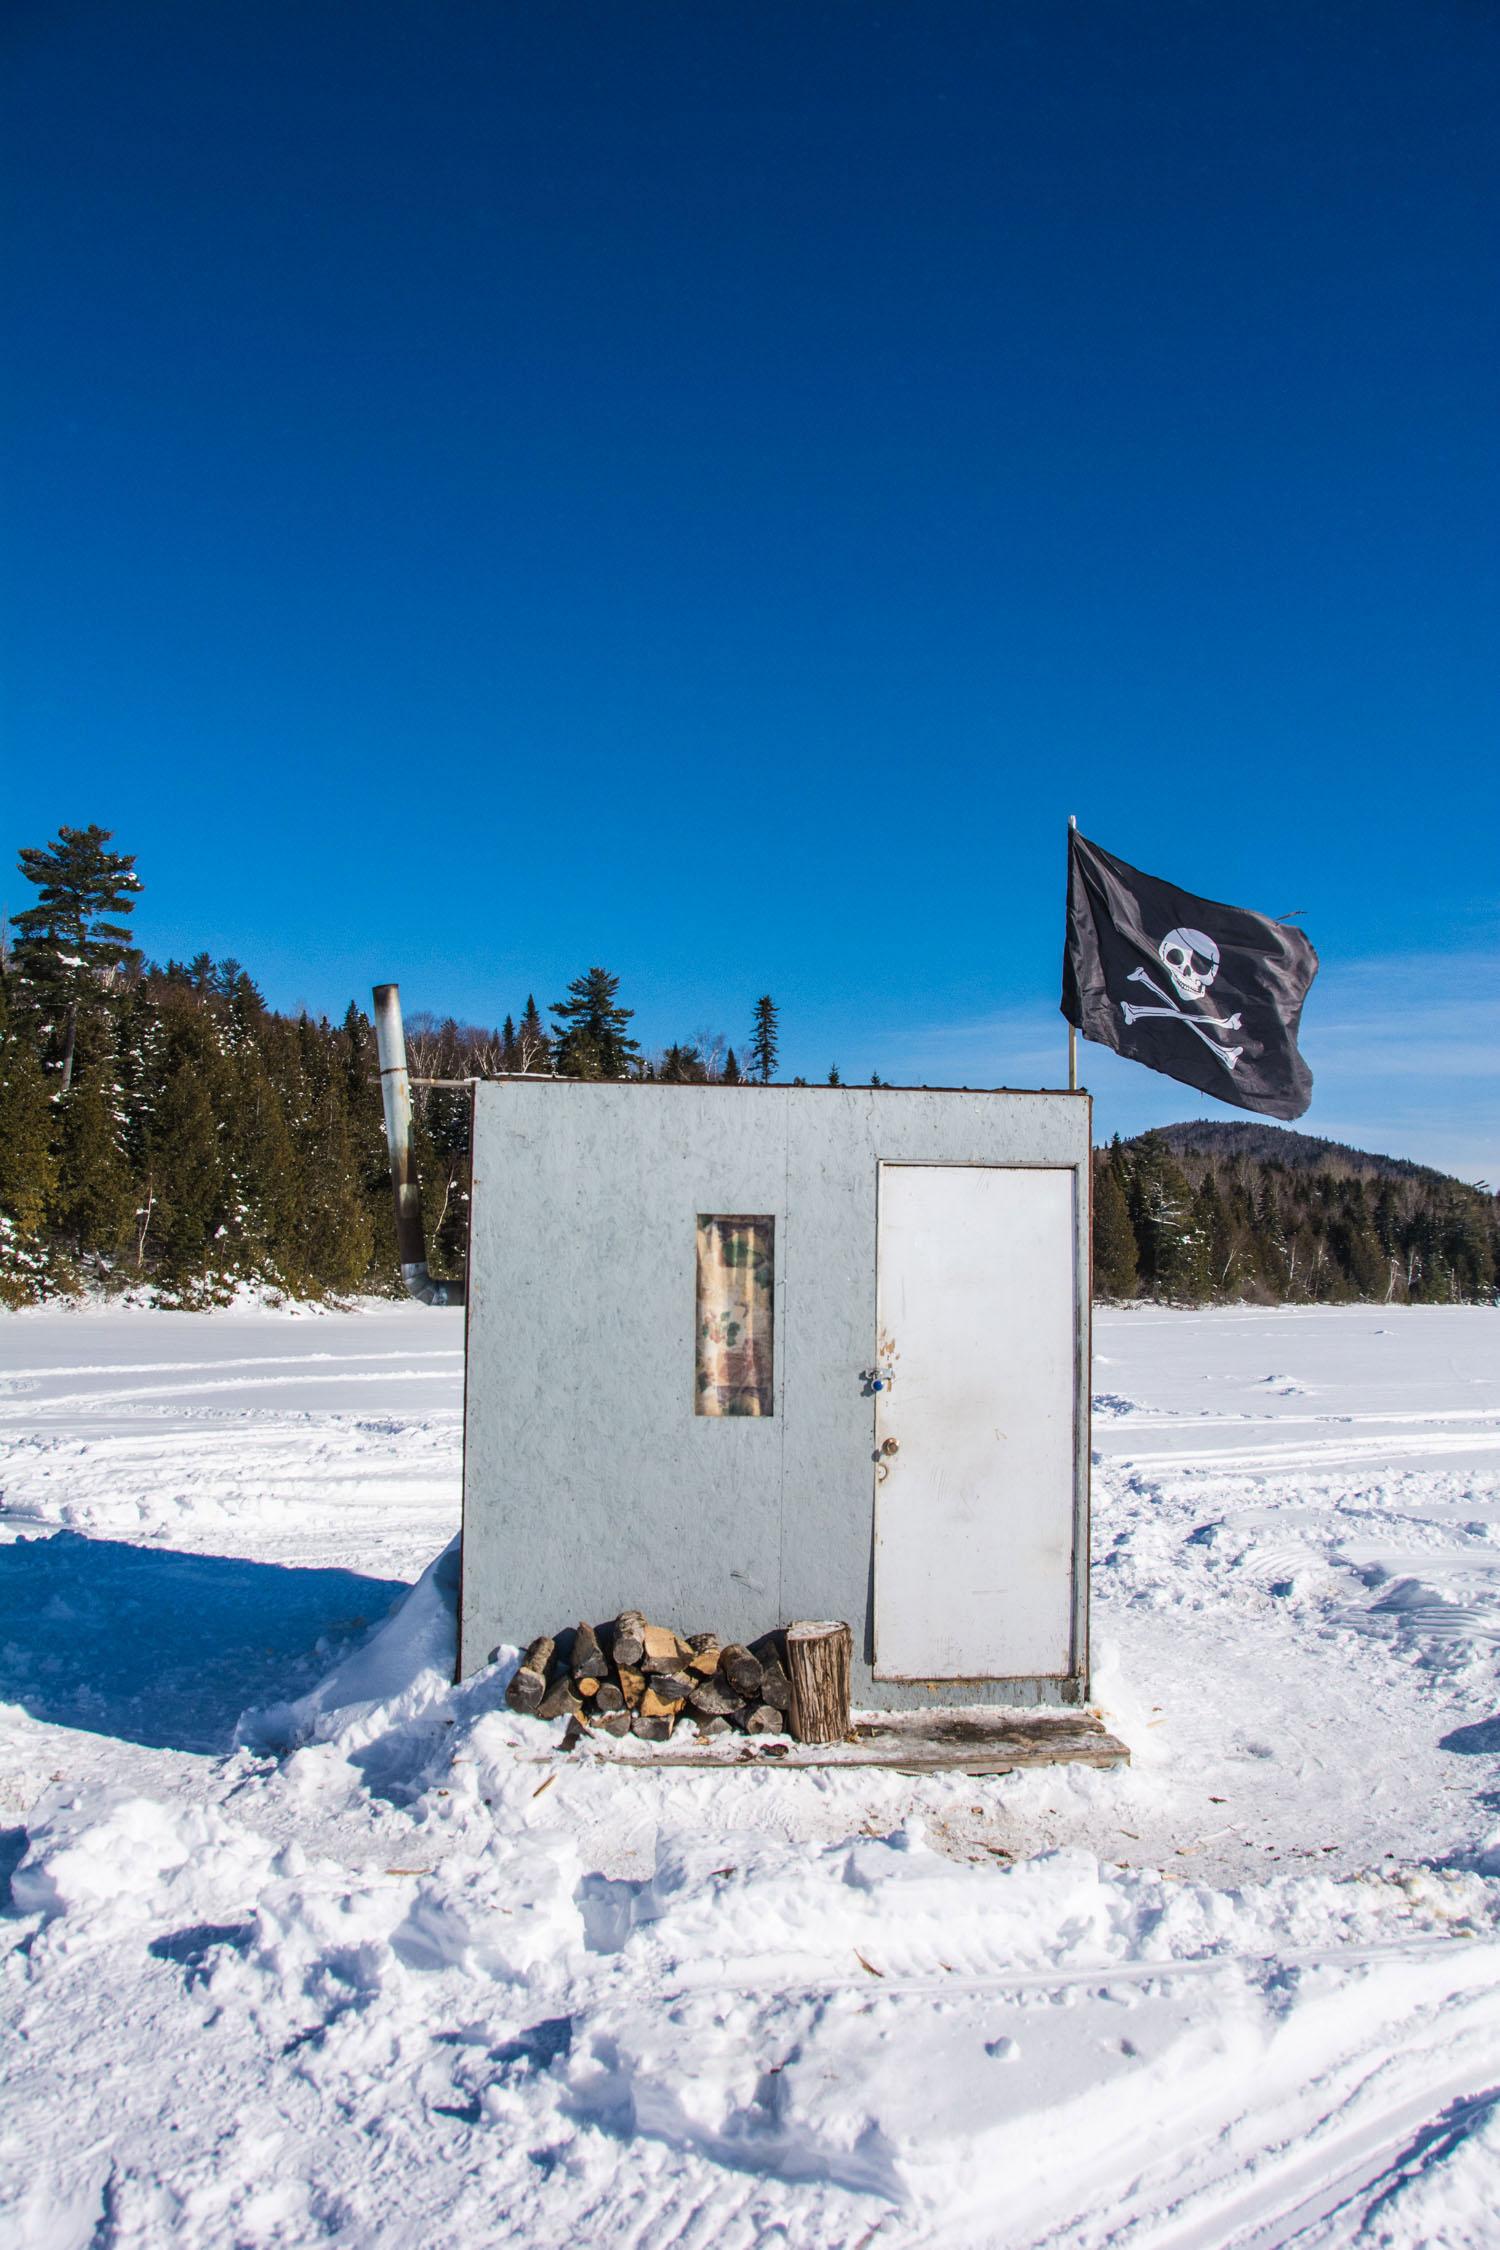 Ice Fishing Hut